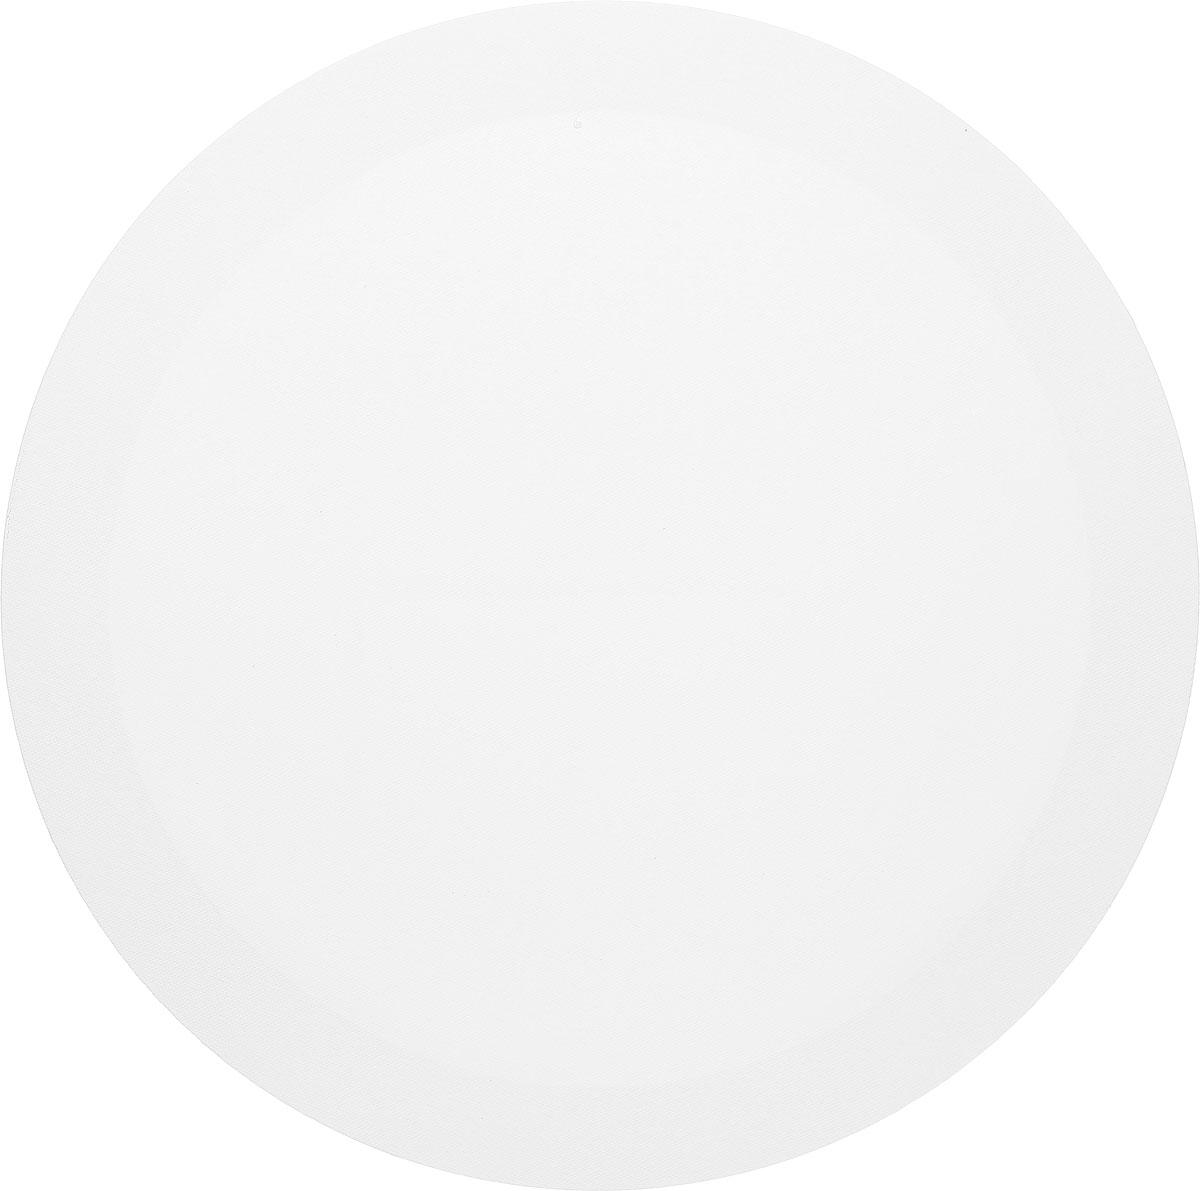 Малевичъ Холст на подрамнике круглый диаметр 50 см 380 г/м2